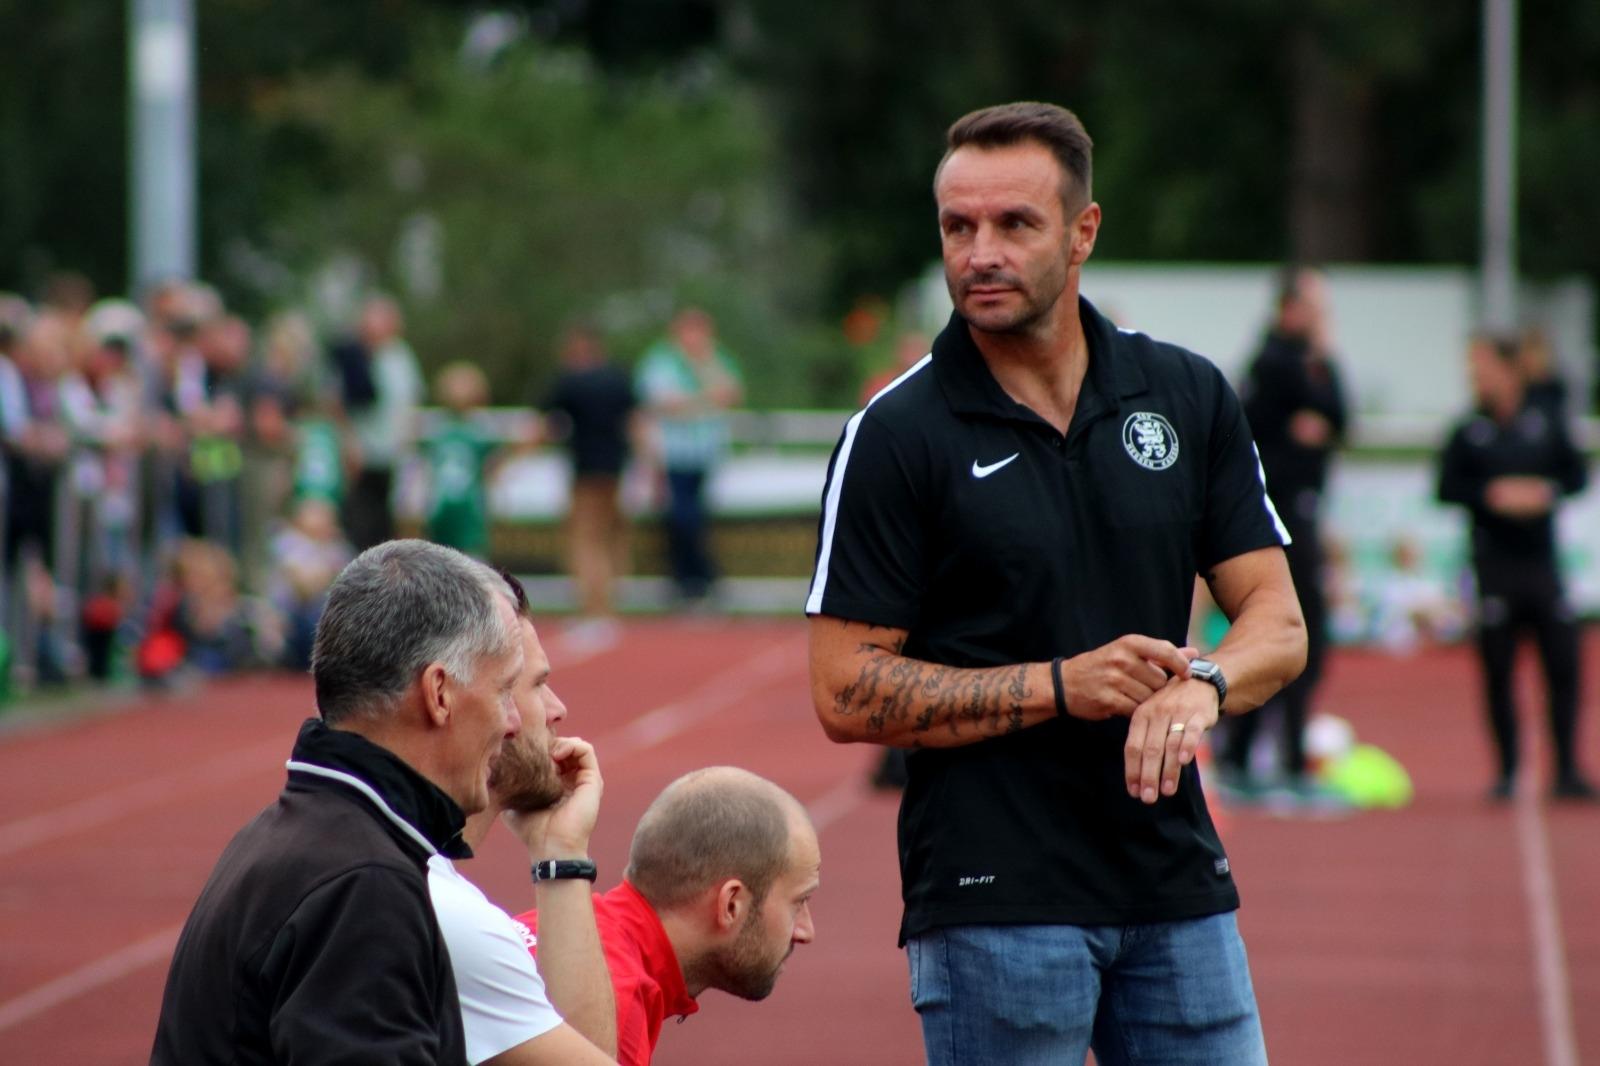 TSV Heiligenrode - KSV Hessen Kassel, Trainer Dietmar Hirsch